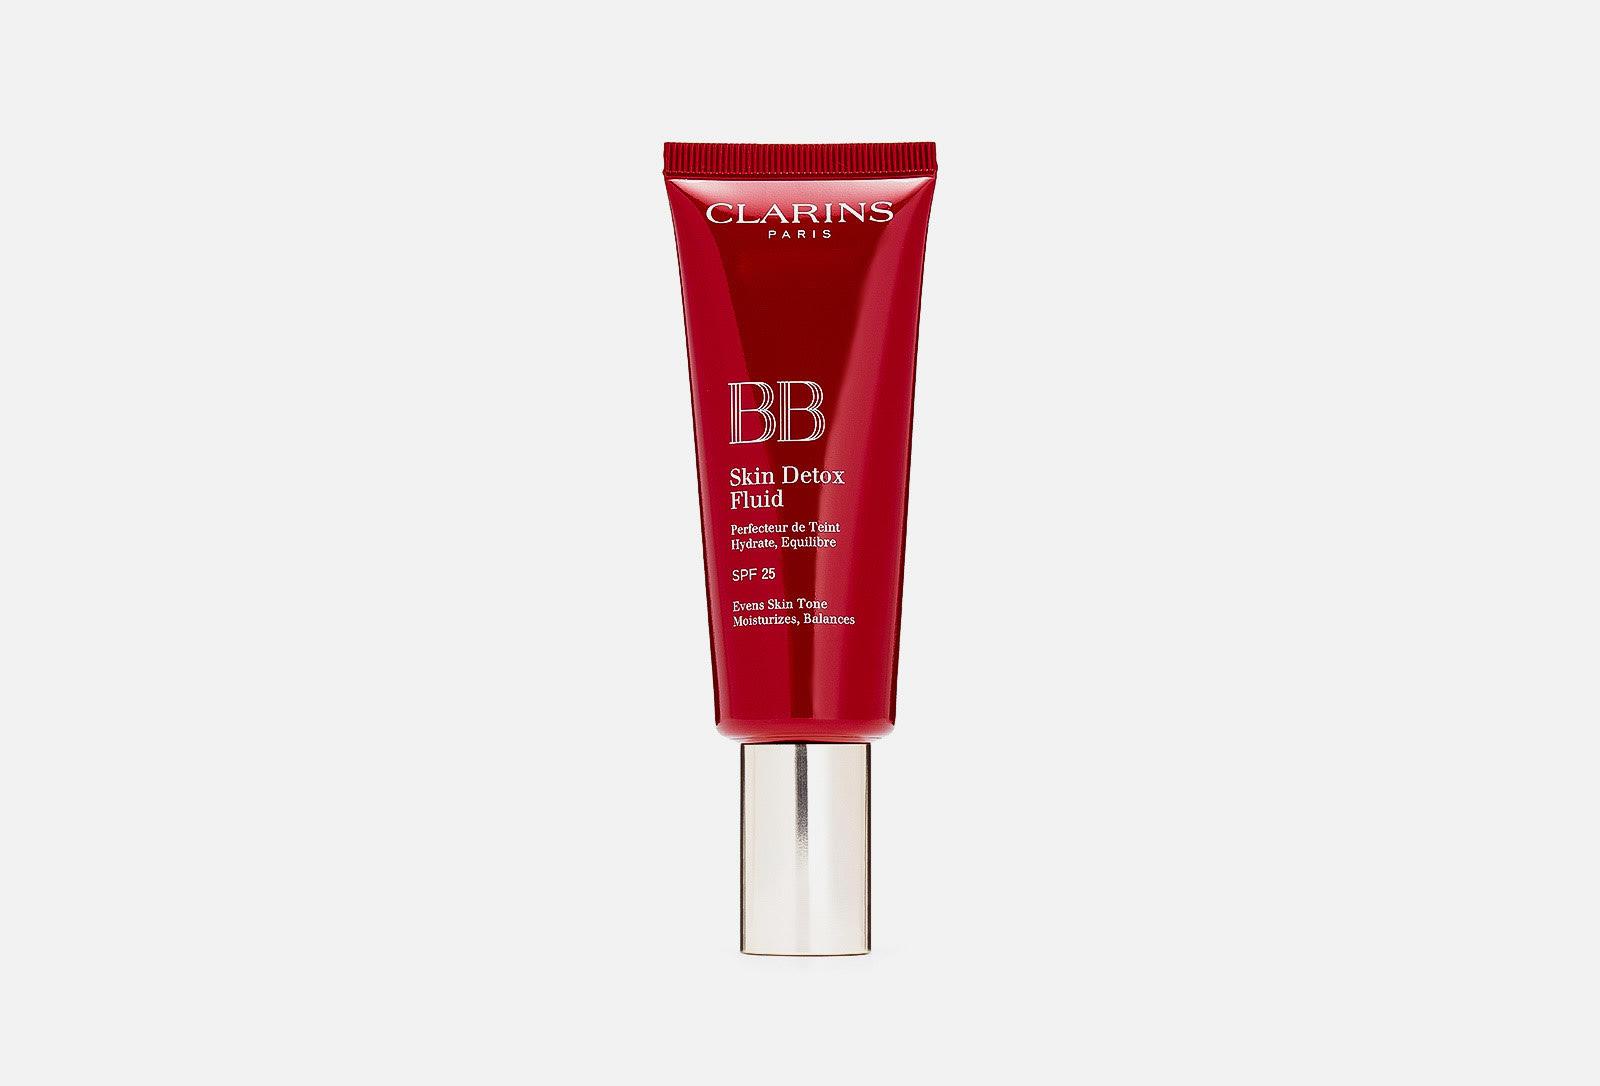 BB-крем Clarins Skin Detox Fluid